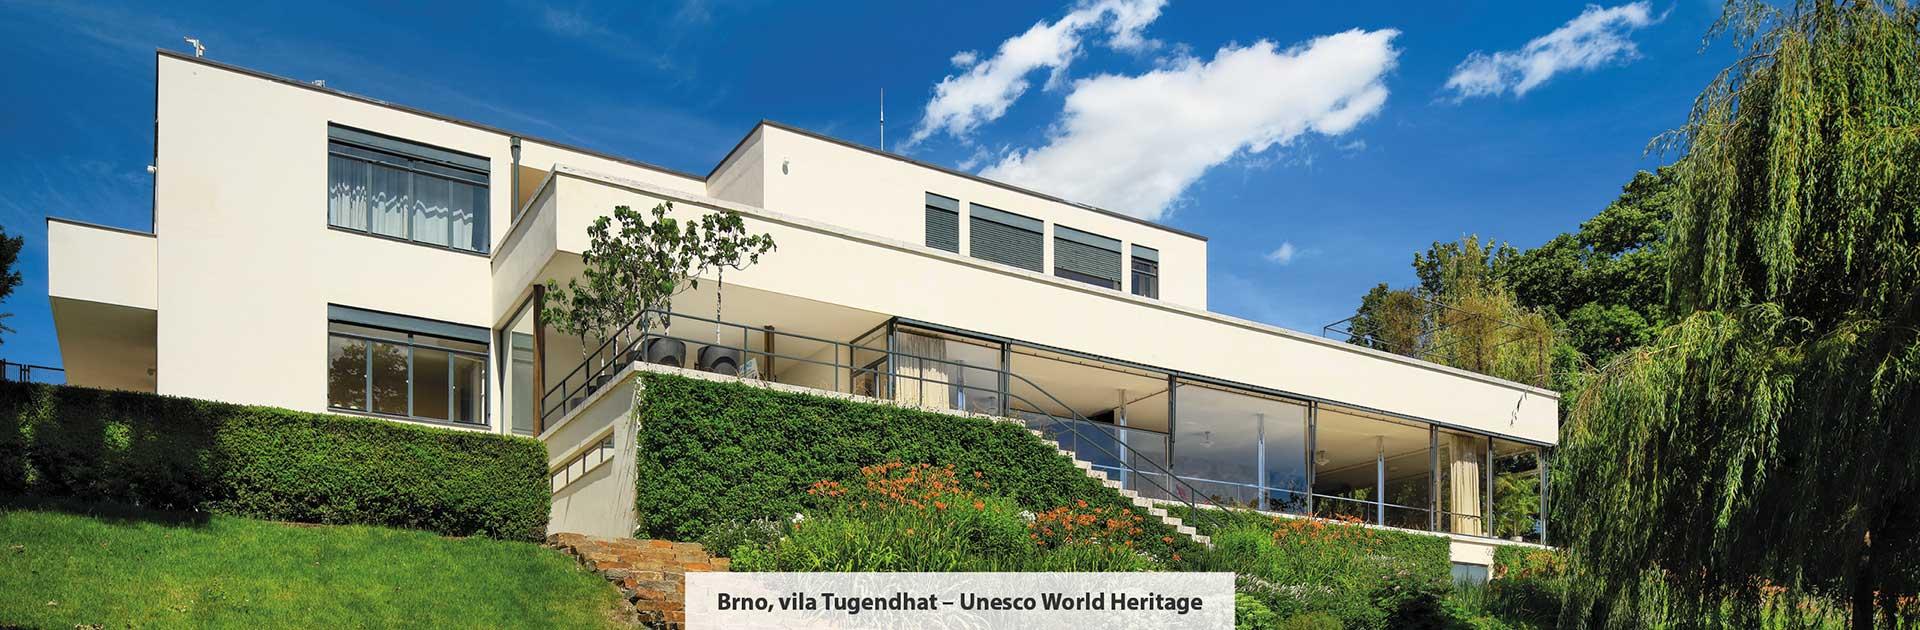 Brno, Vila Tugendhat - Unesco World Heritage